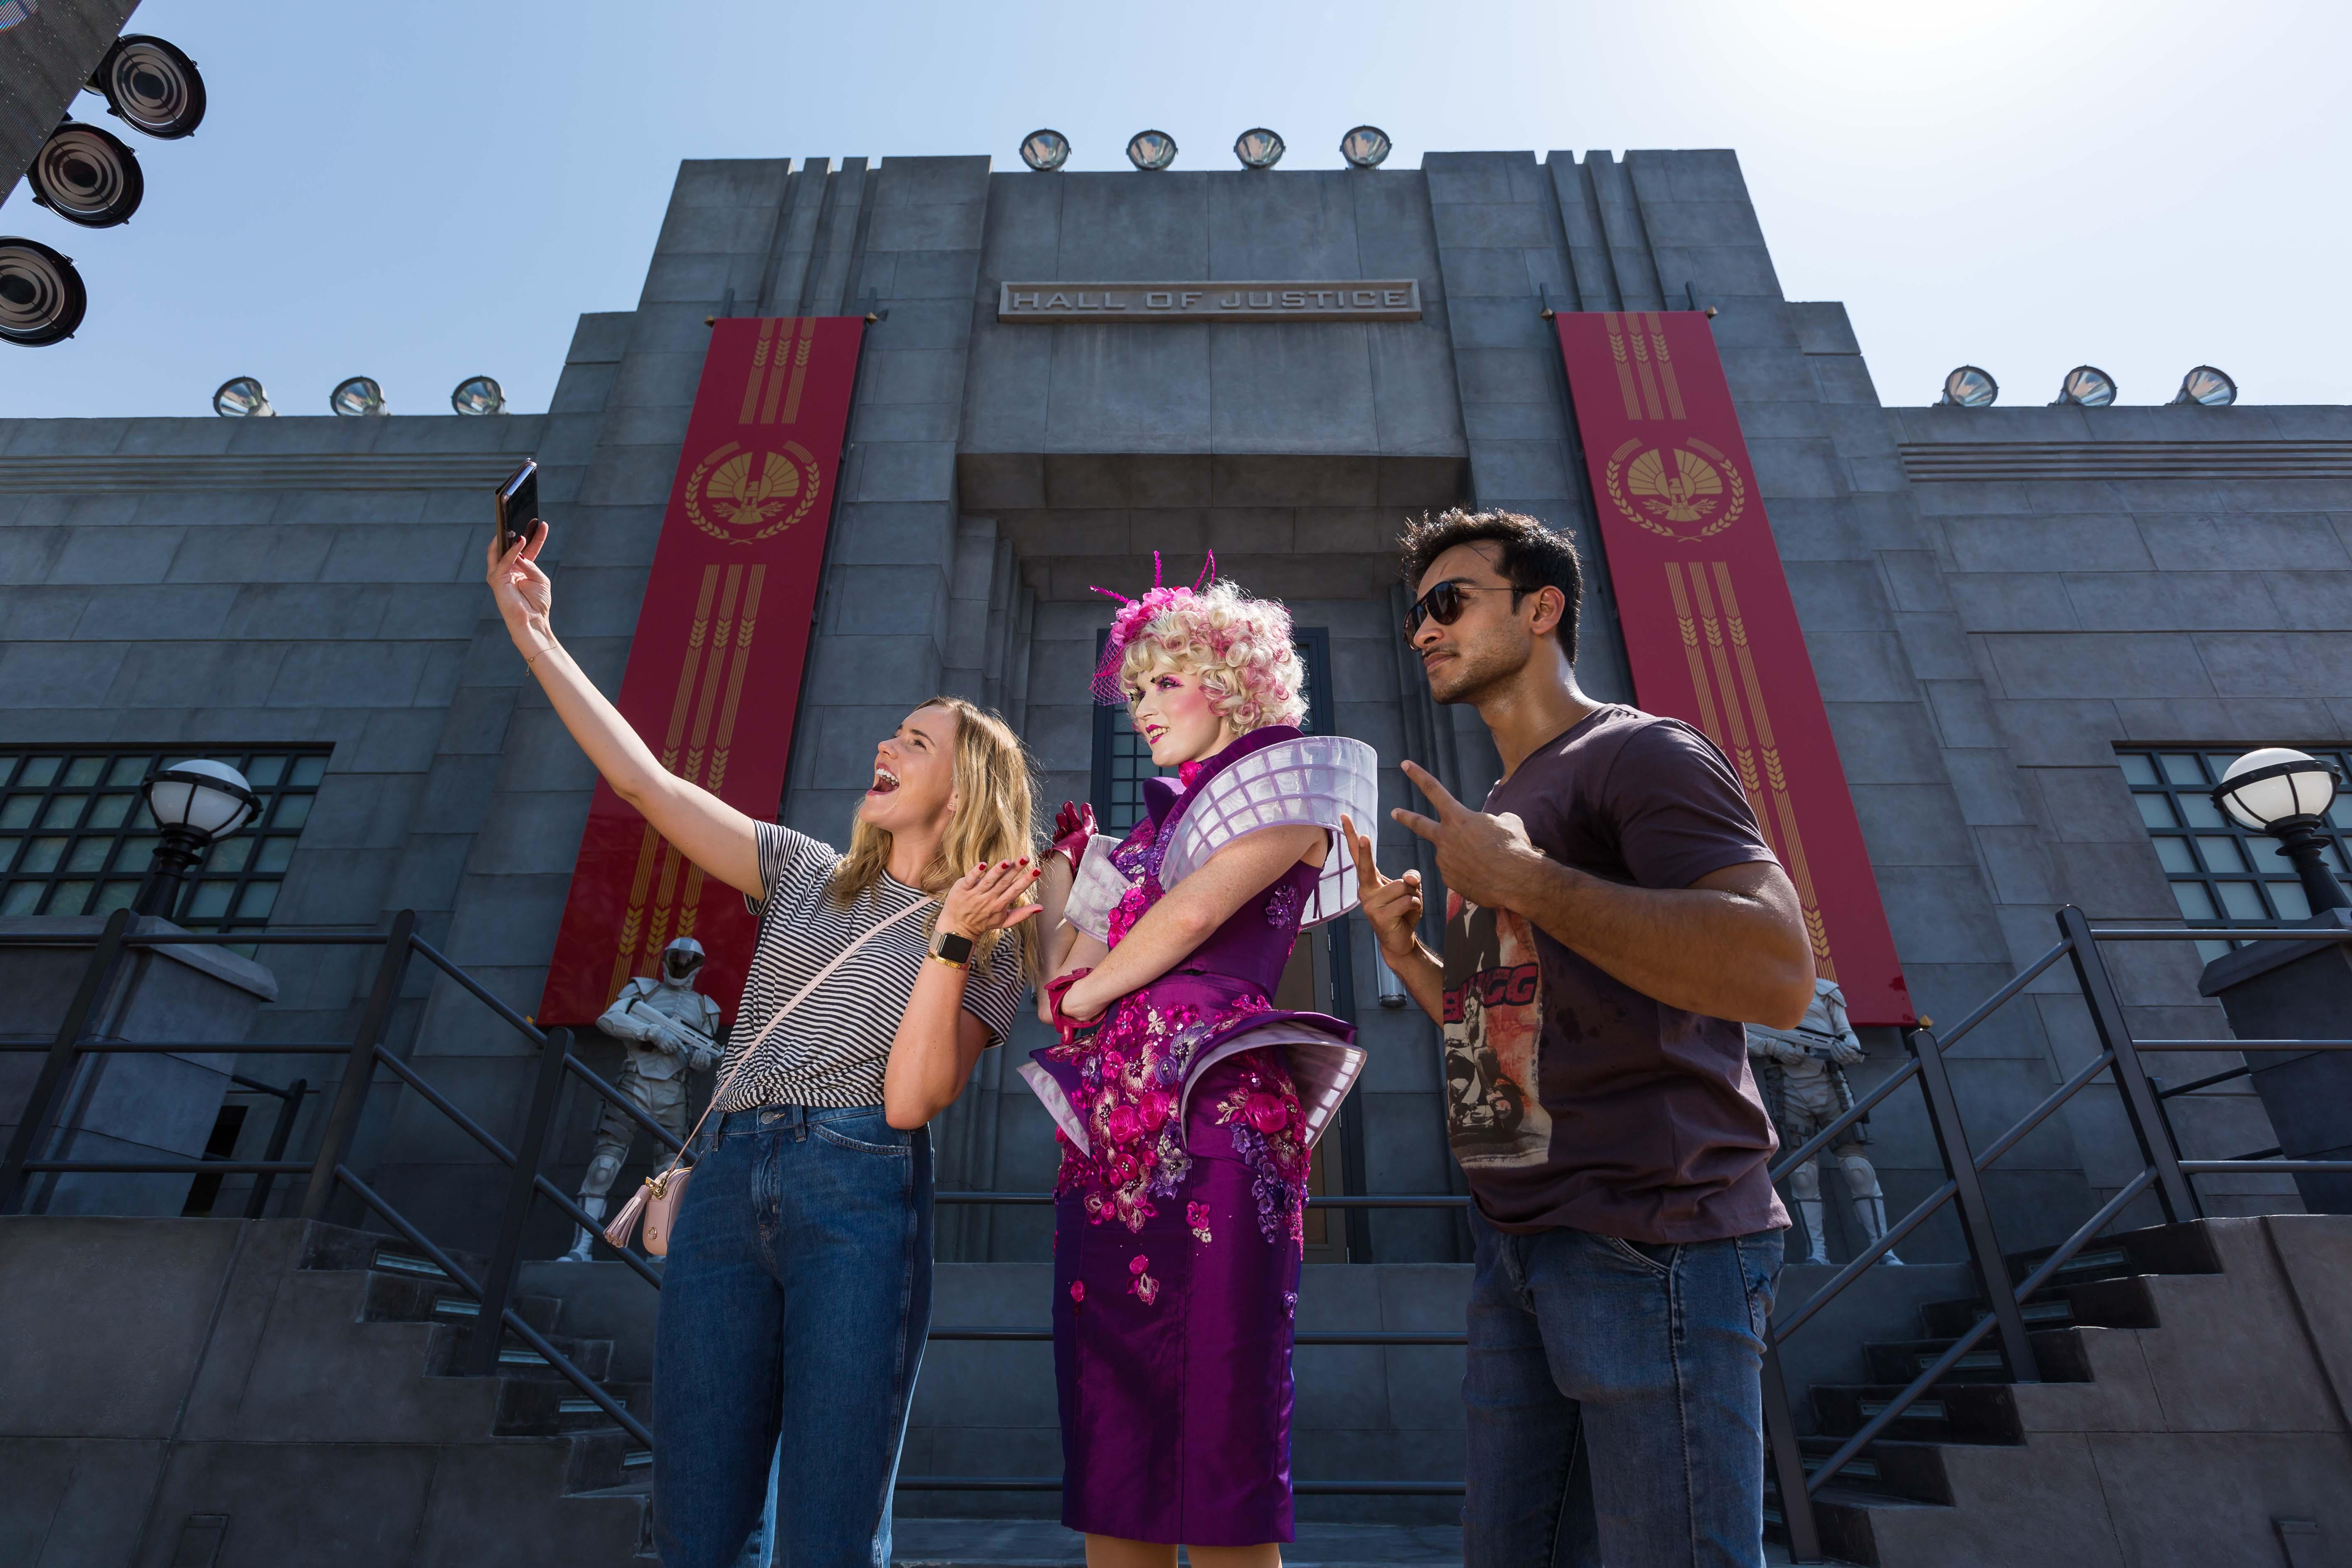 The Hunger Games | MOTIONGATE™ Dubai